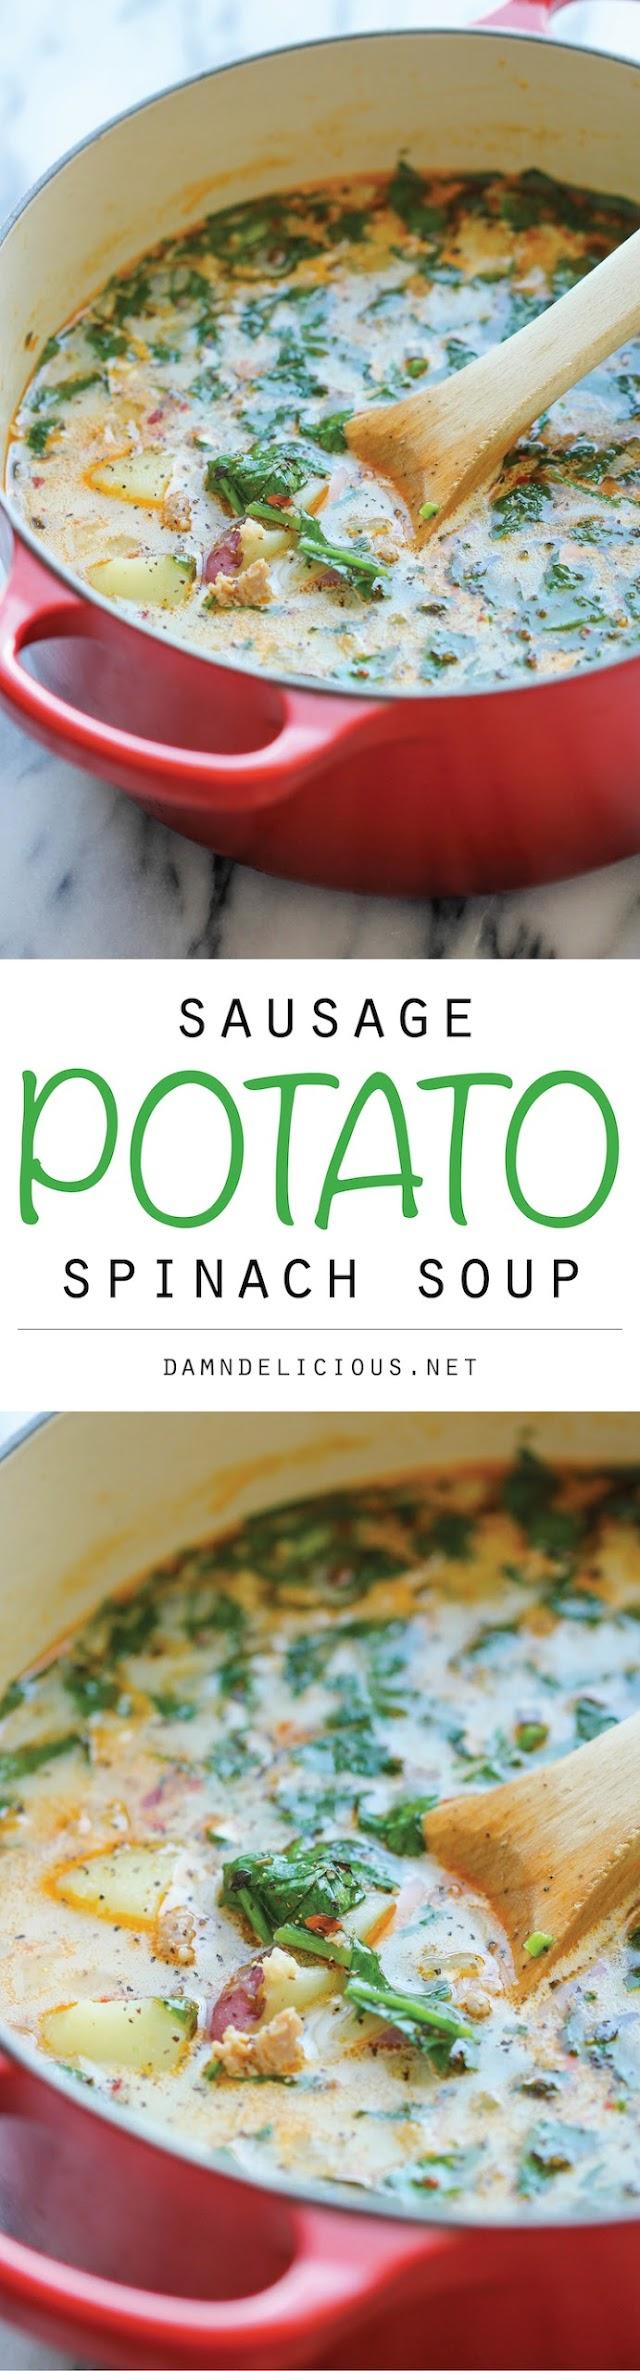 Sausage, Potato and Spinach Soup Recipe